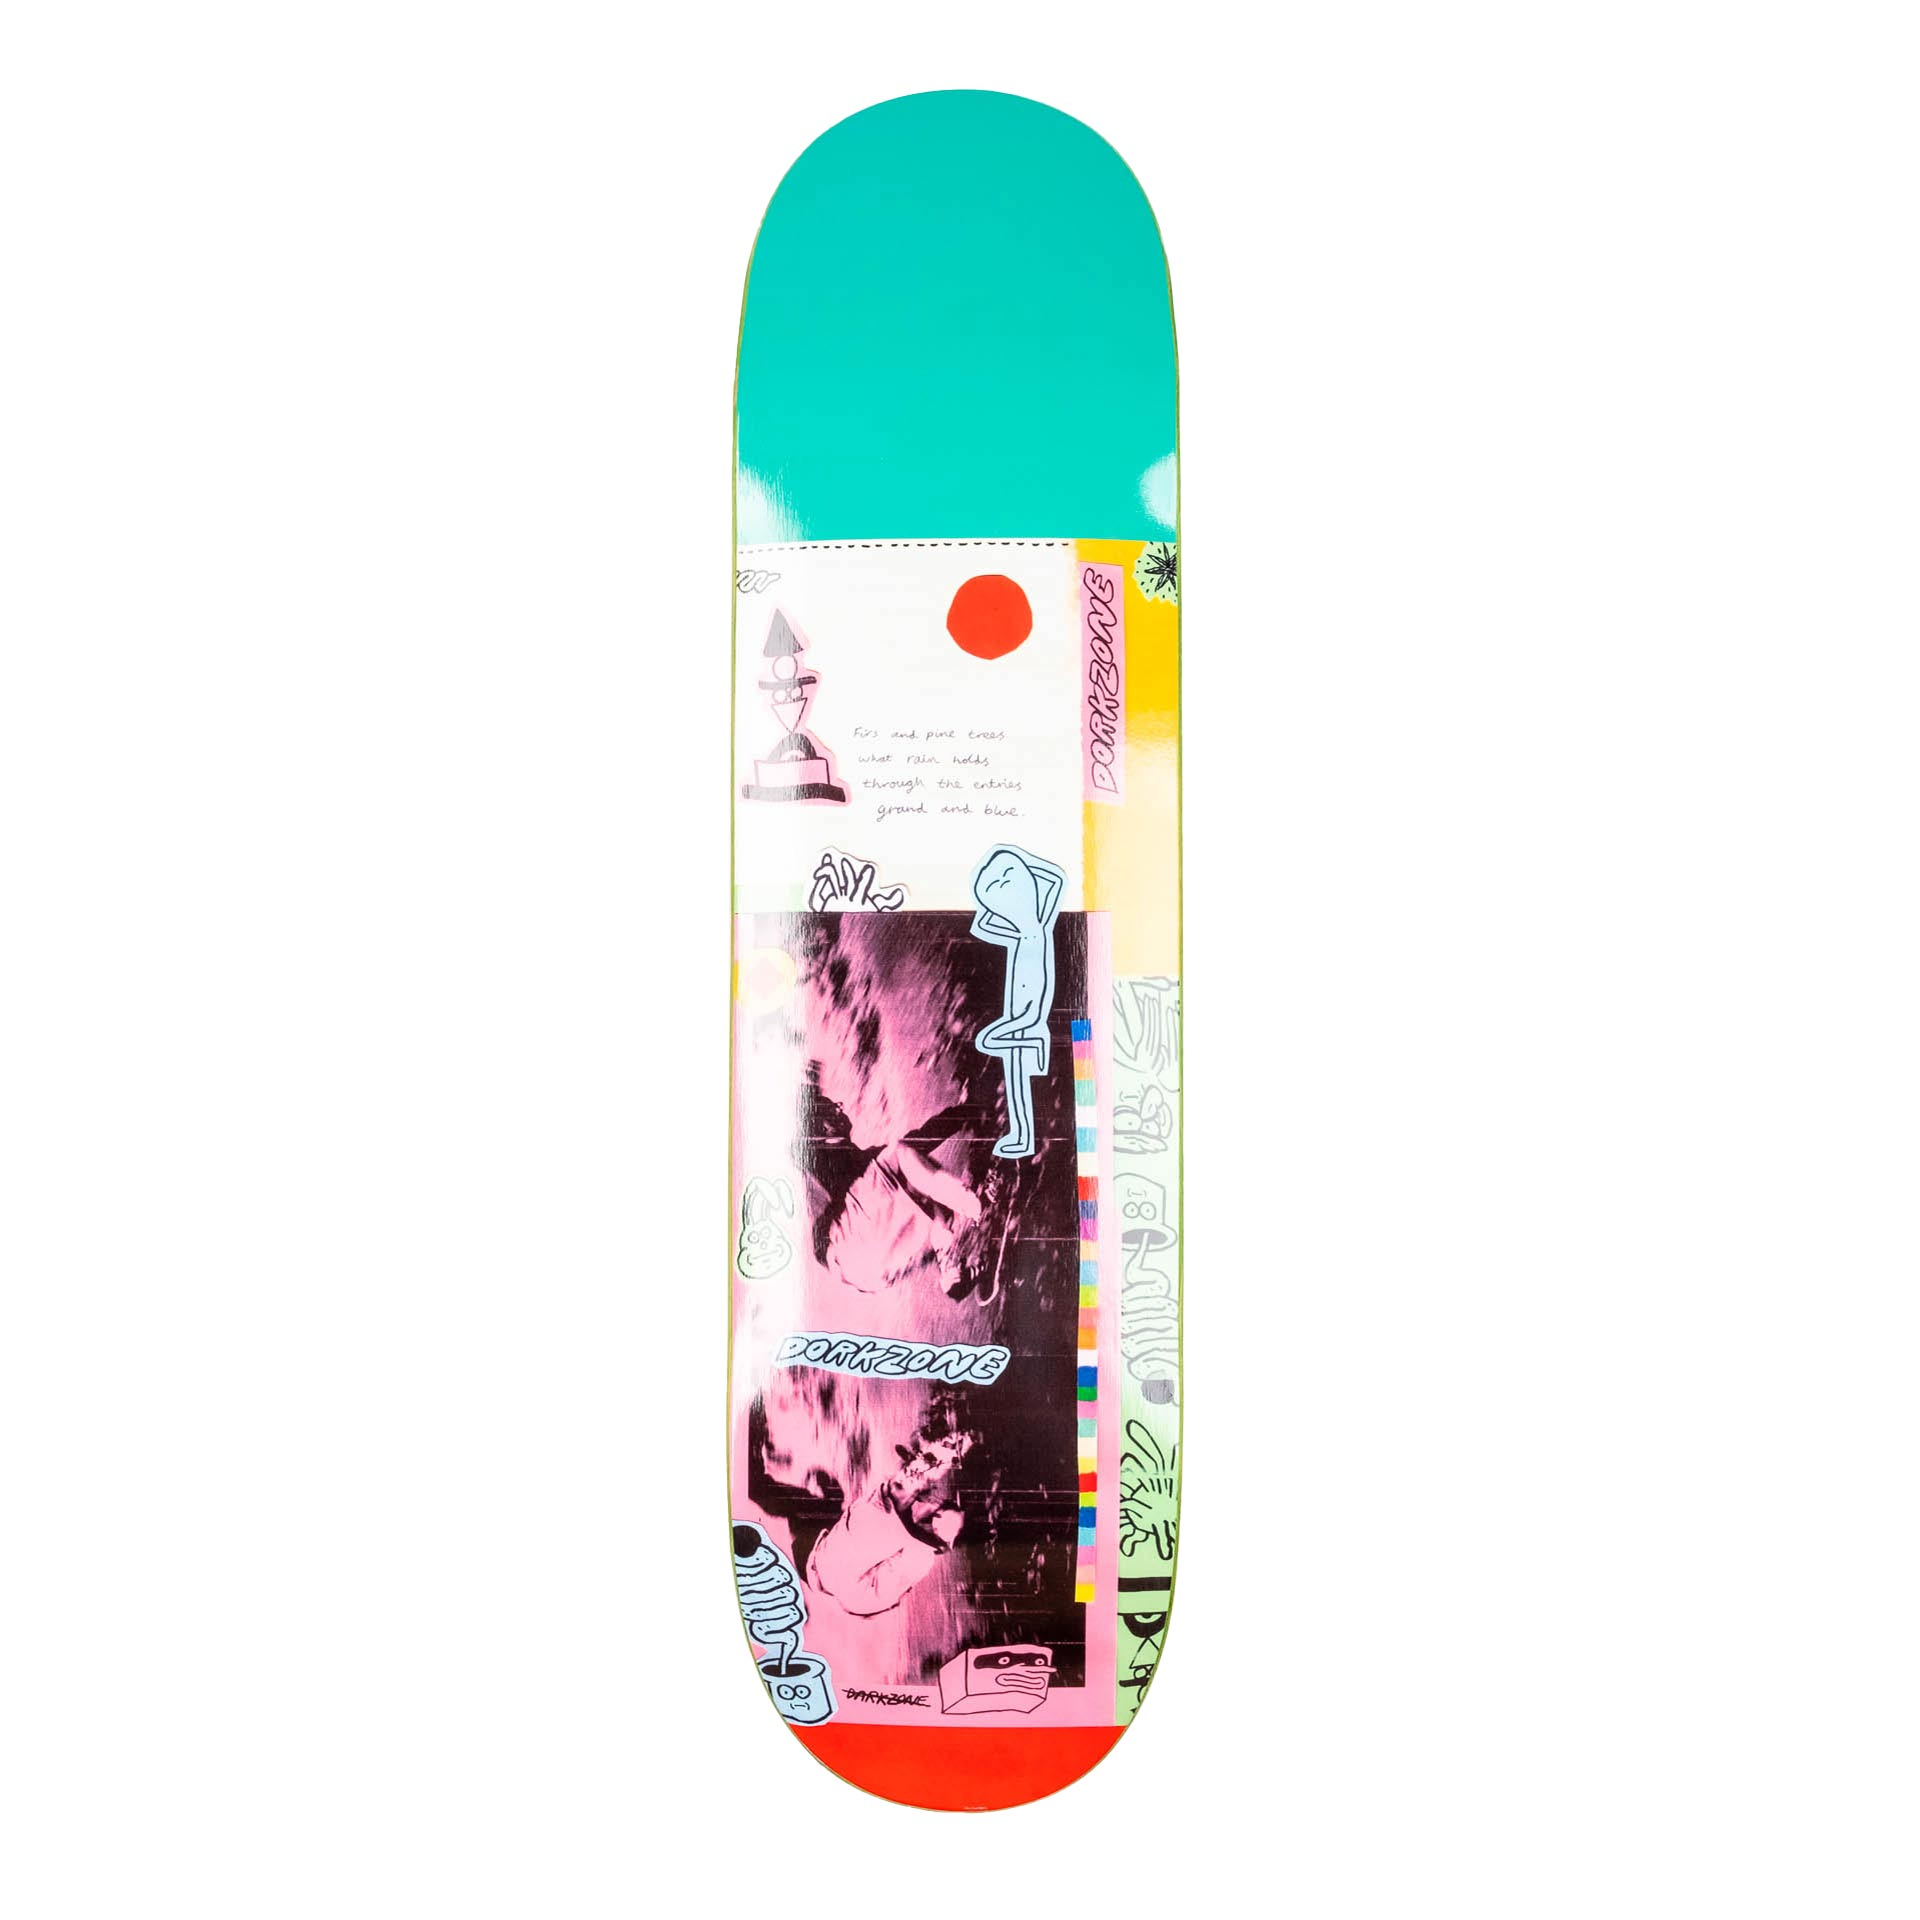 Dorkzone Darkzone Collage Skateboard